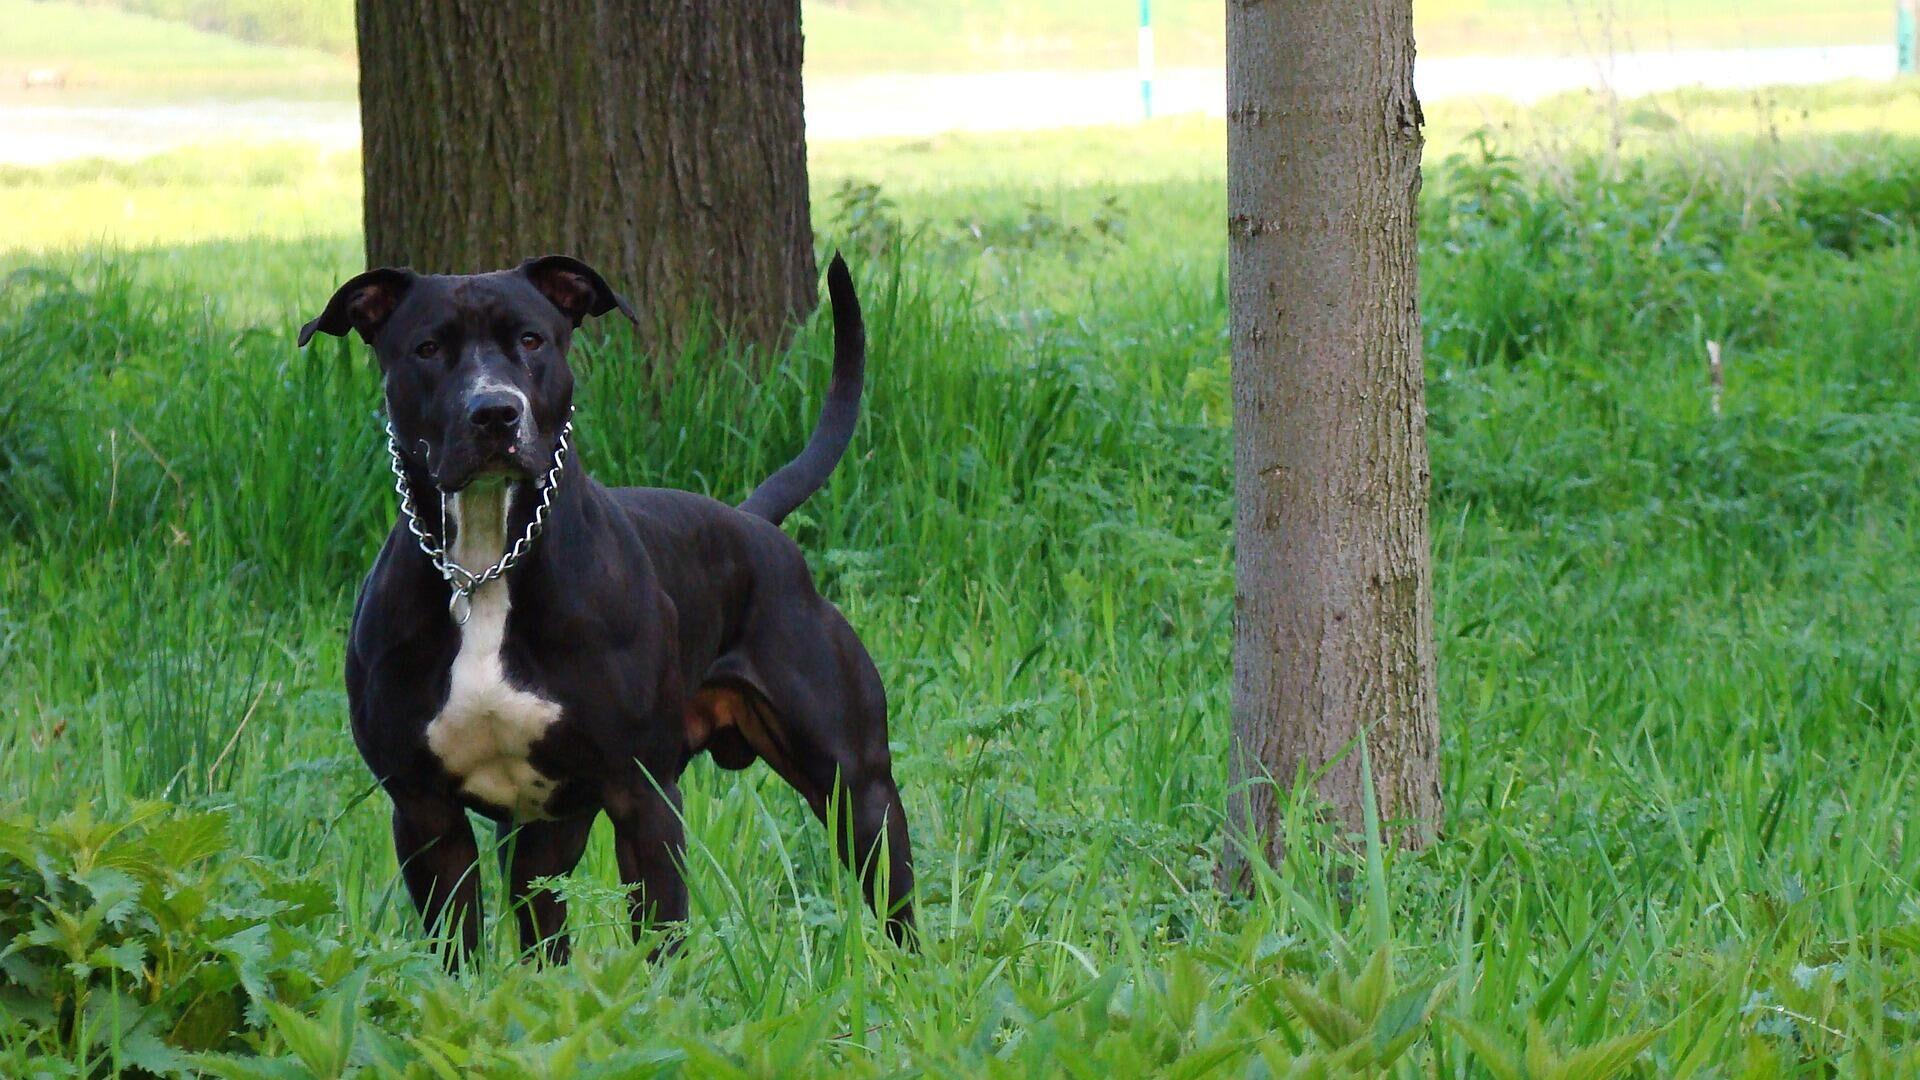 Perro de raza American Staffordshire Terrier - Sputnik Mundo, 1920, 18.06.2021